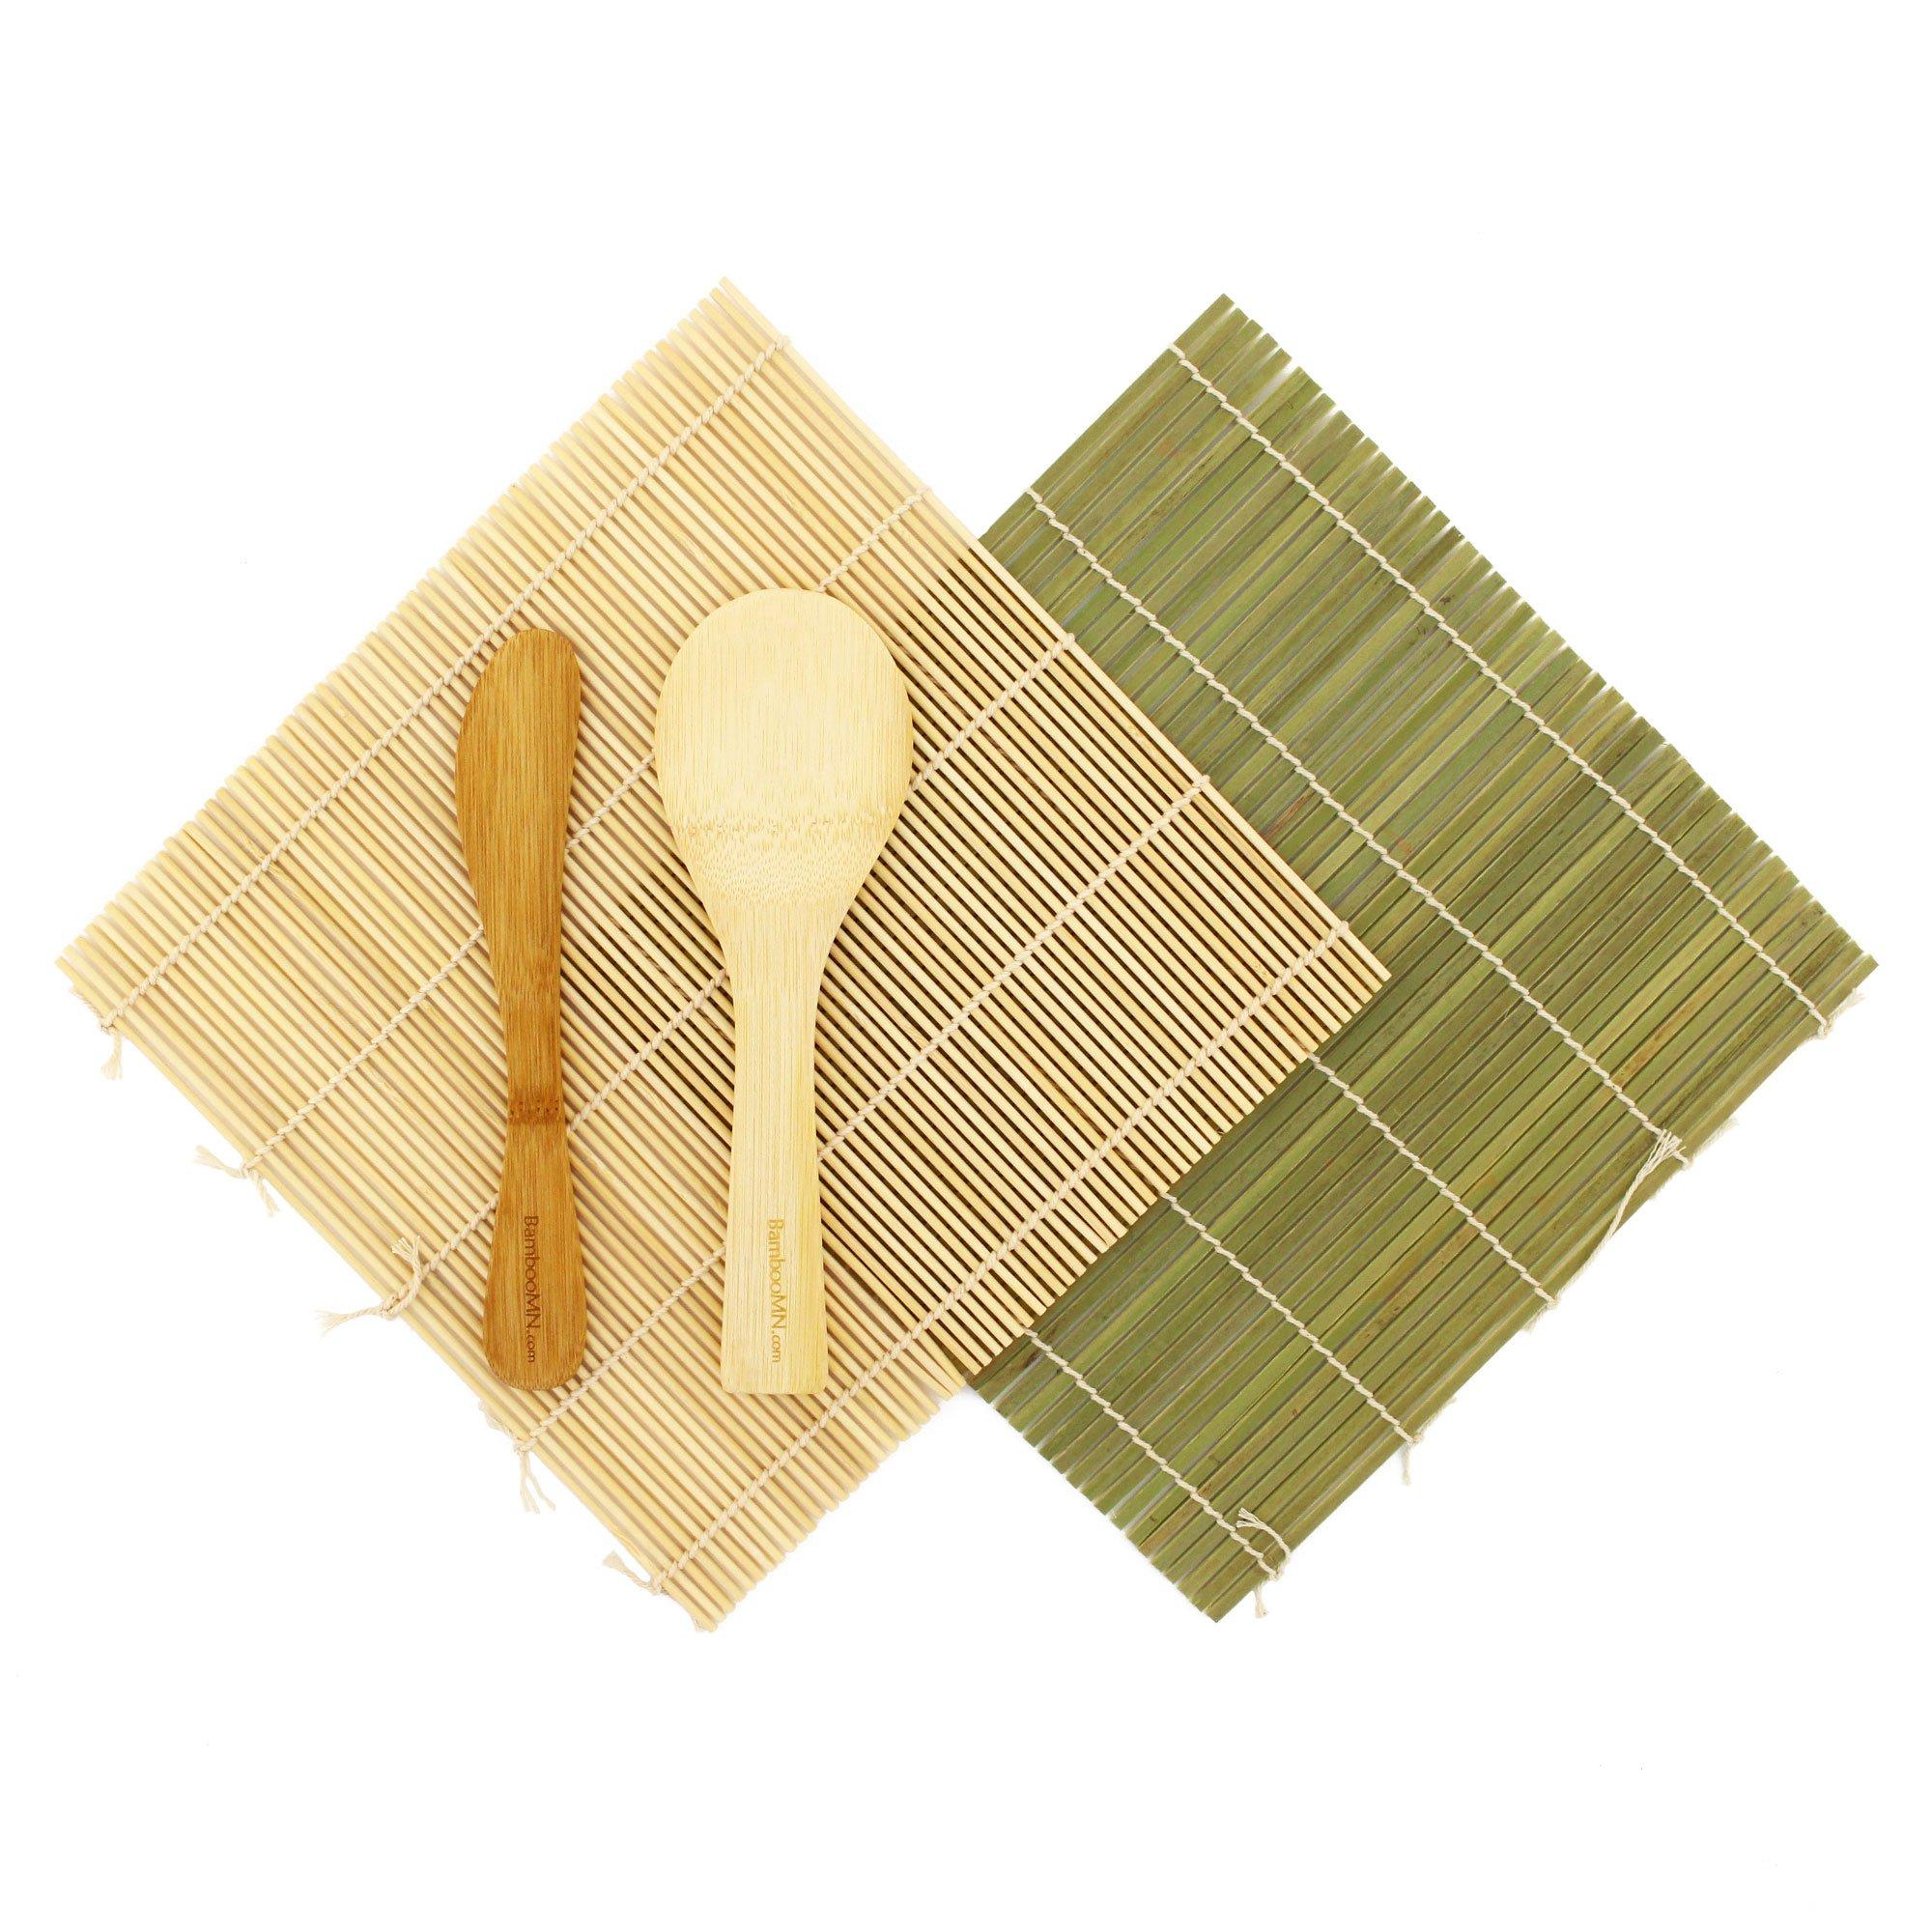 BambooMN Sushi Maker Kit 1x Green 1x Natural Bamboo Rolling Mats, 1x Rice Paddle, 1x Spreader   100% Bamboo Mats and Utensils